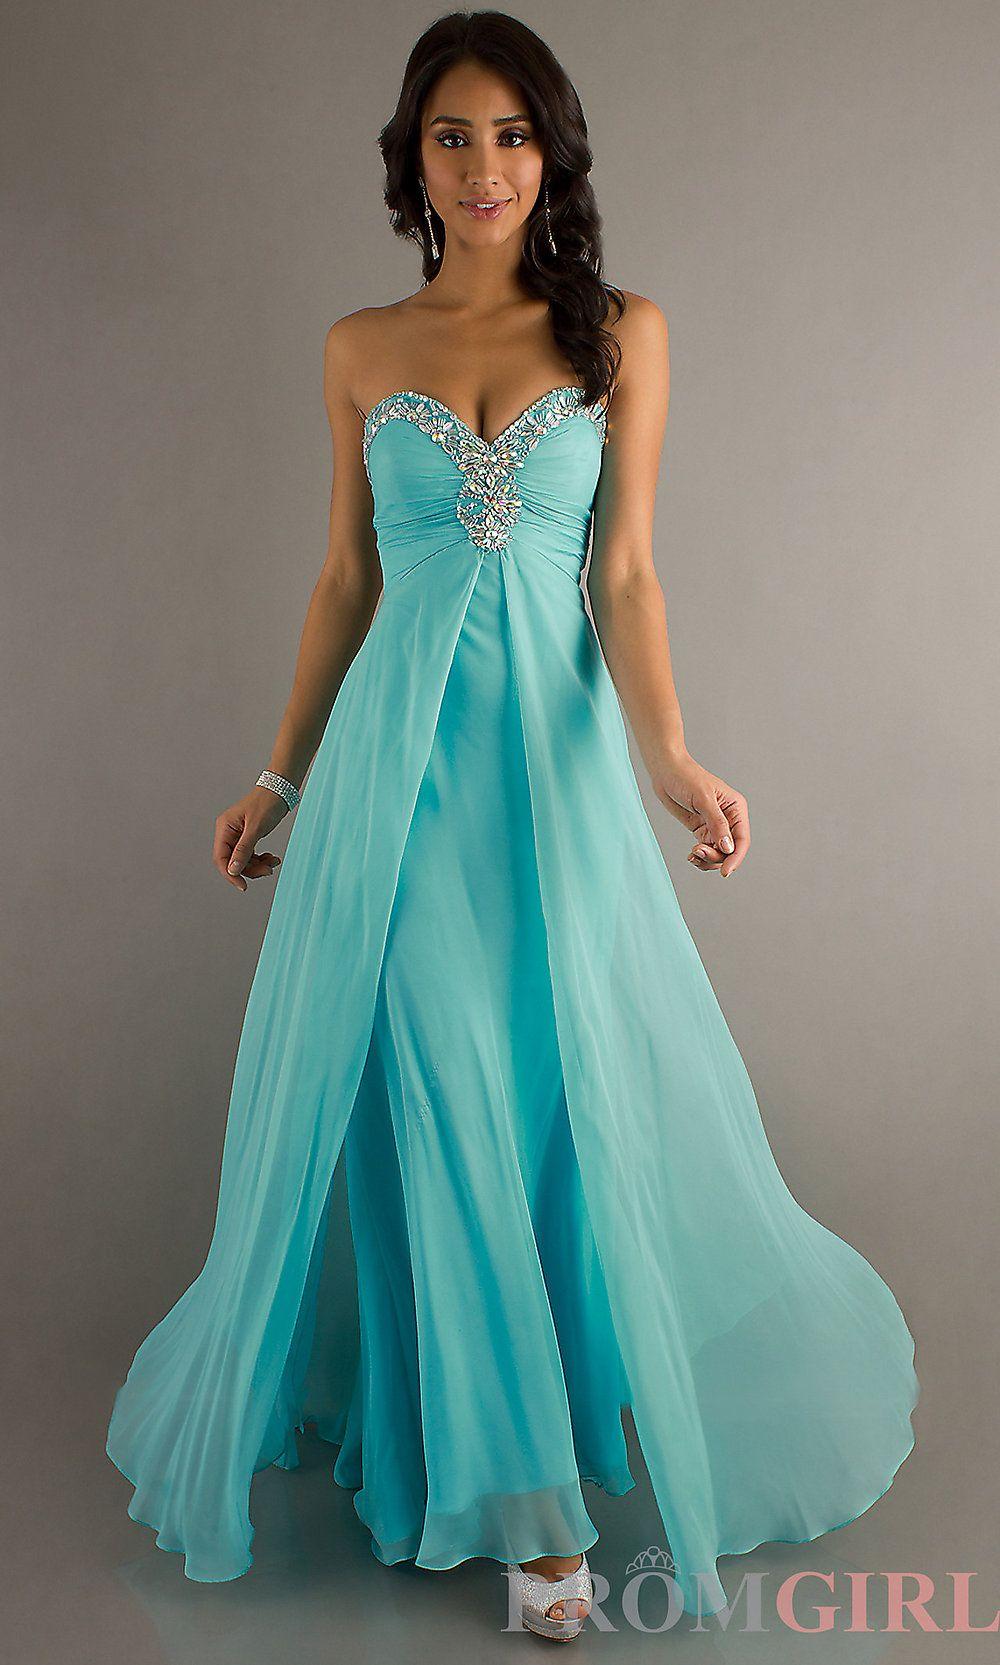 aqua blush prom | Strapless Long Prom Dresses, Blush Strapless ...